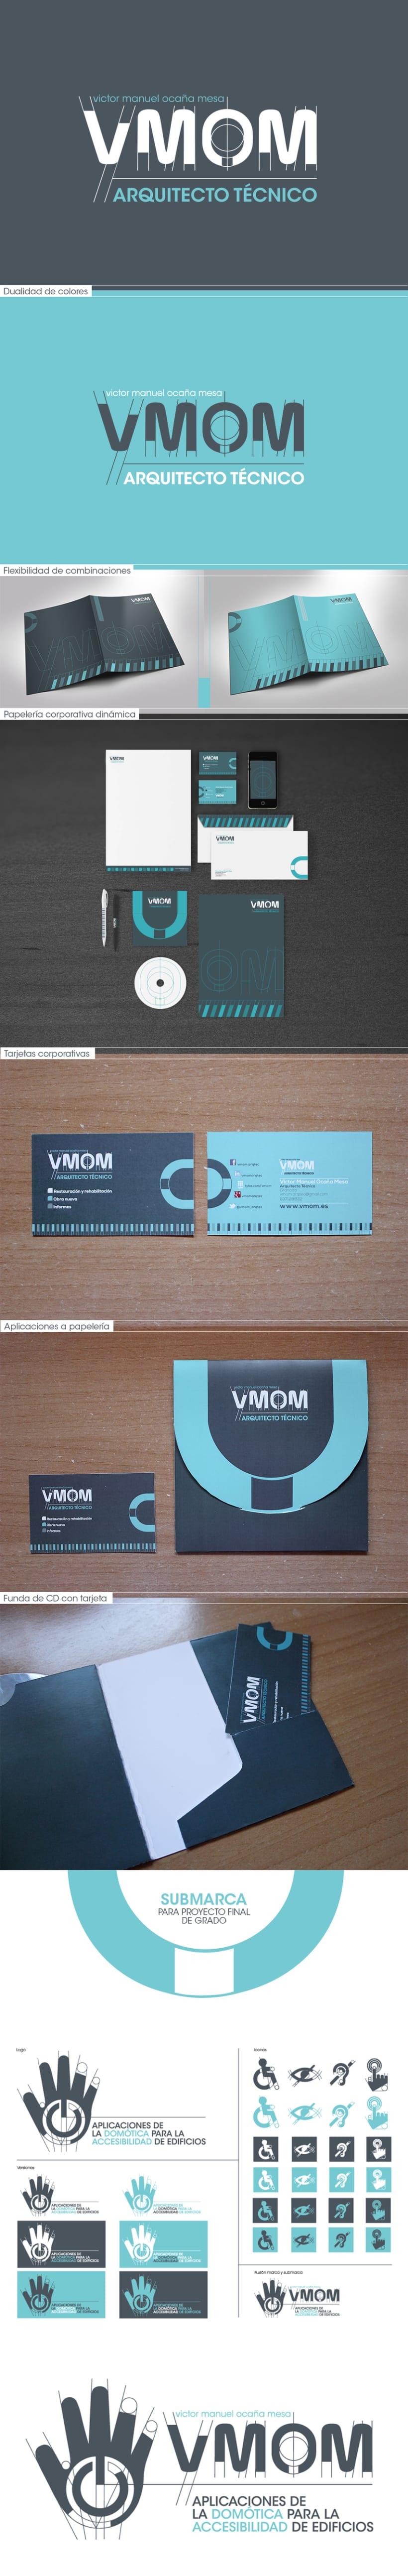 VMOM. Arquitecto Técnico / Building Surveyor -1